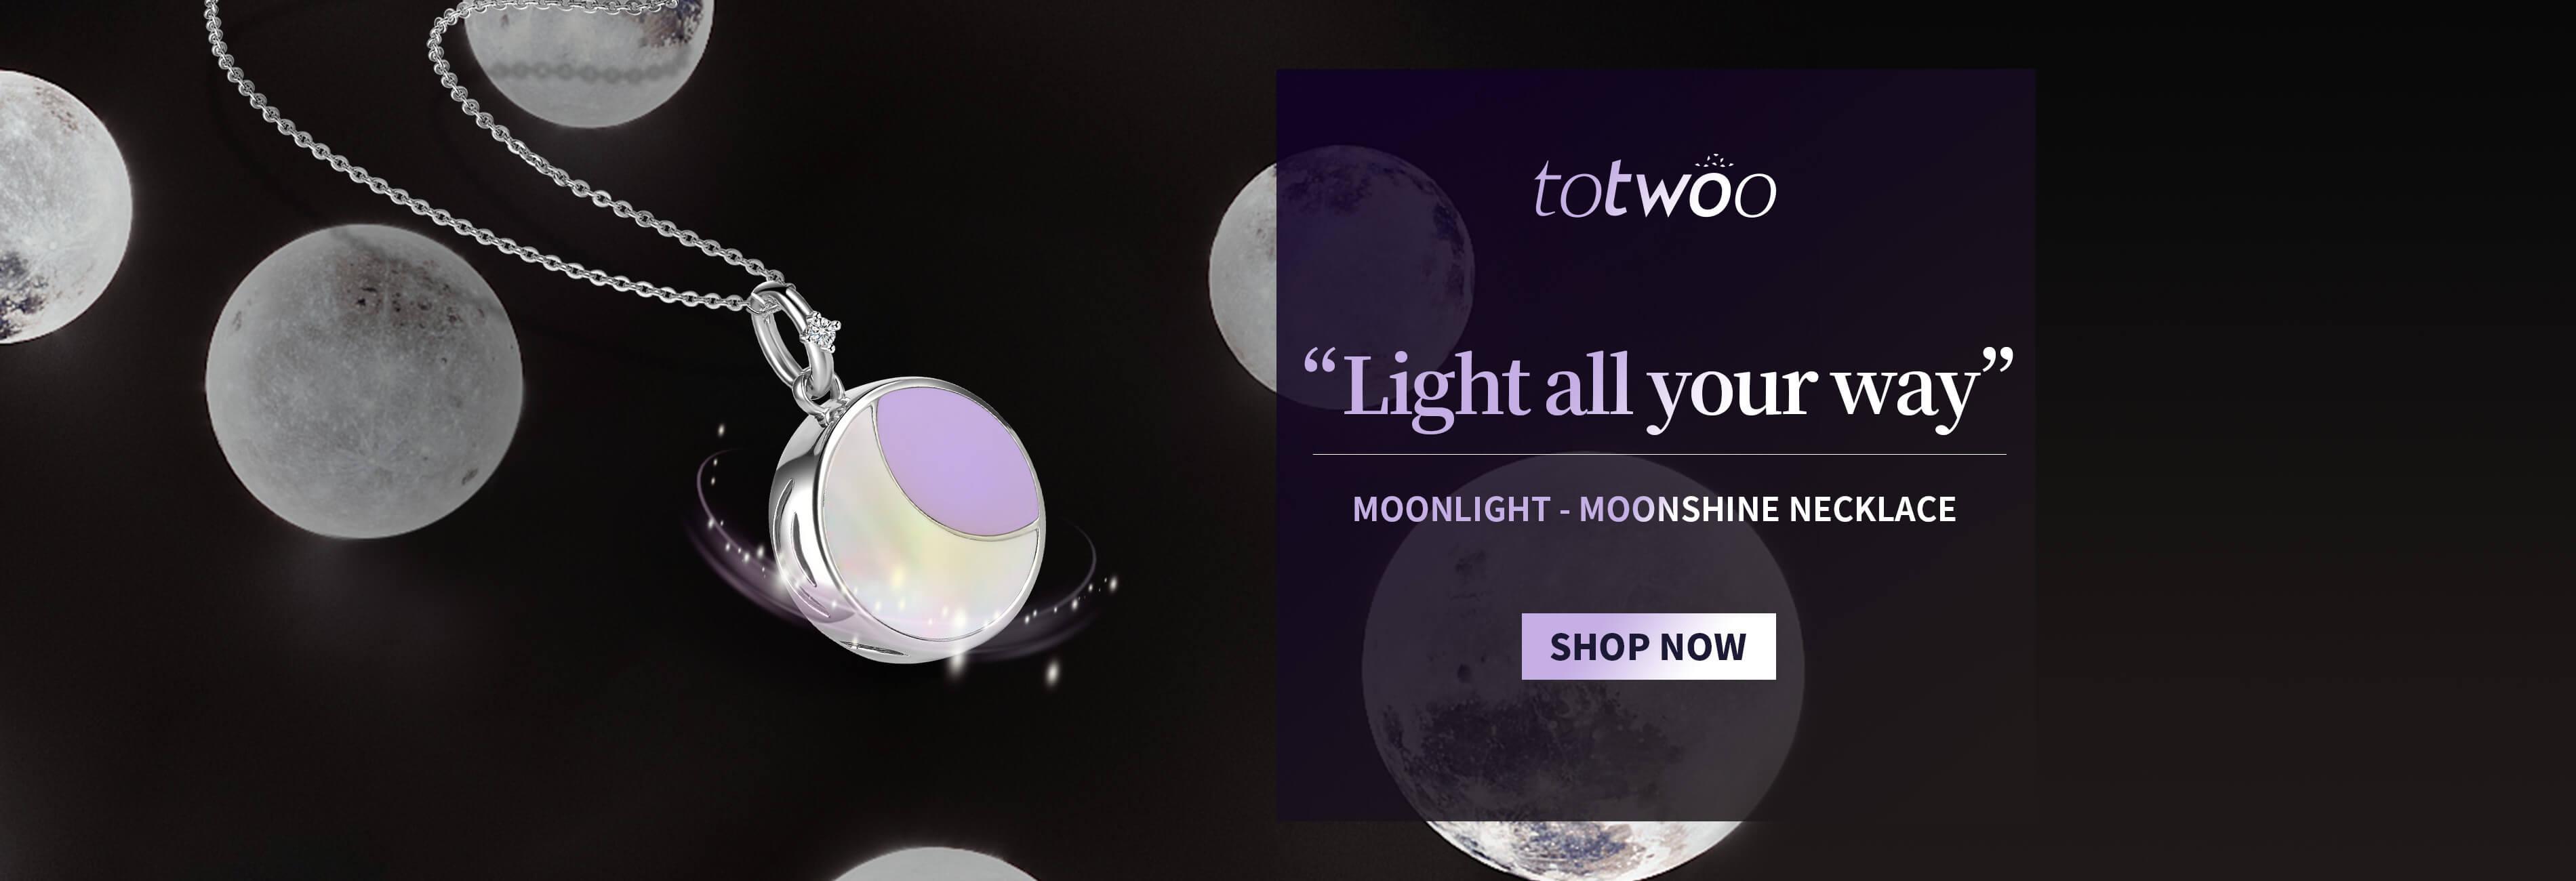 Totwoo moonlight necklace